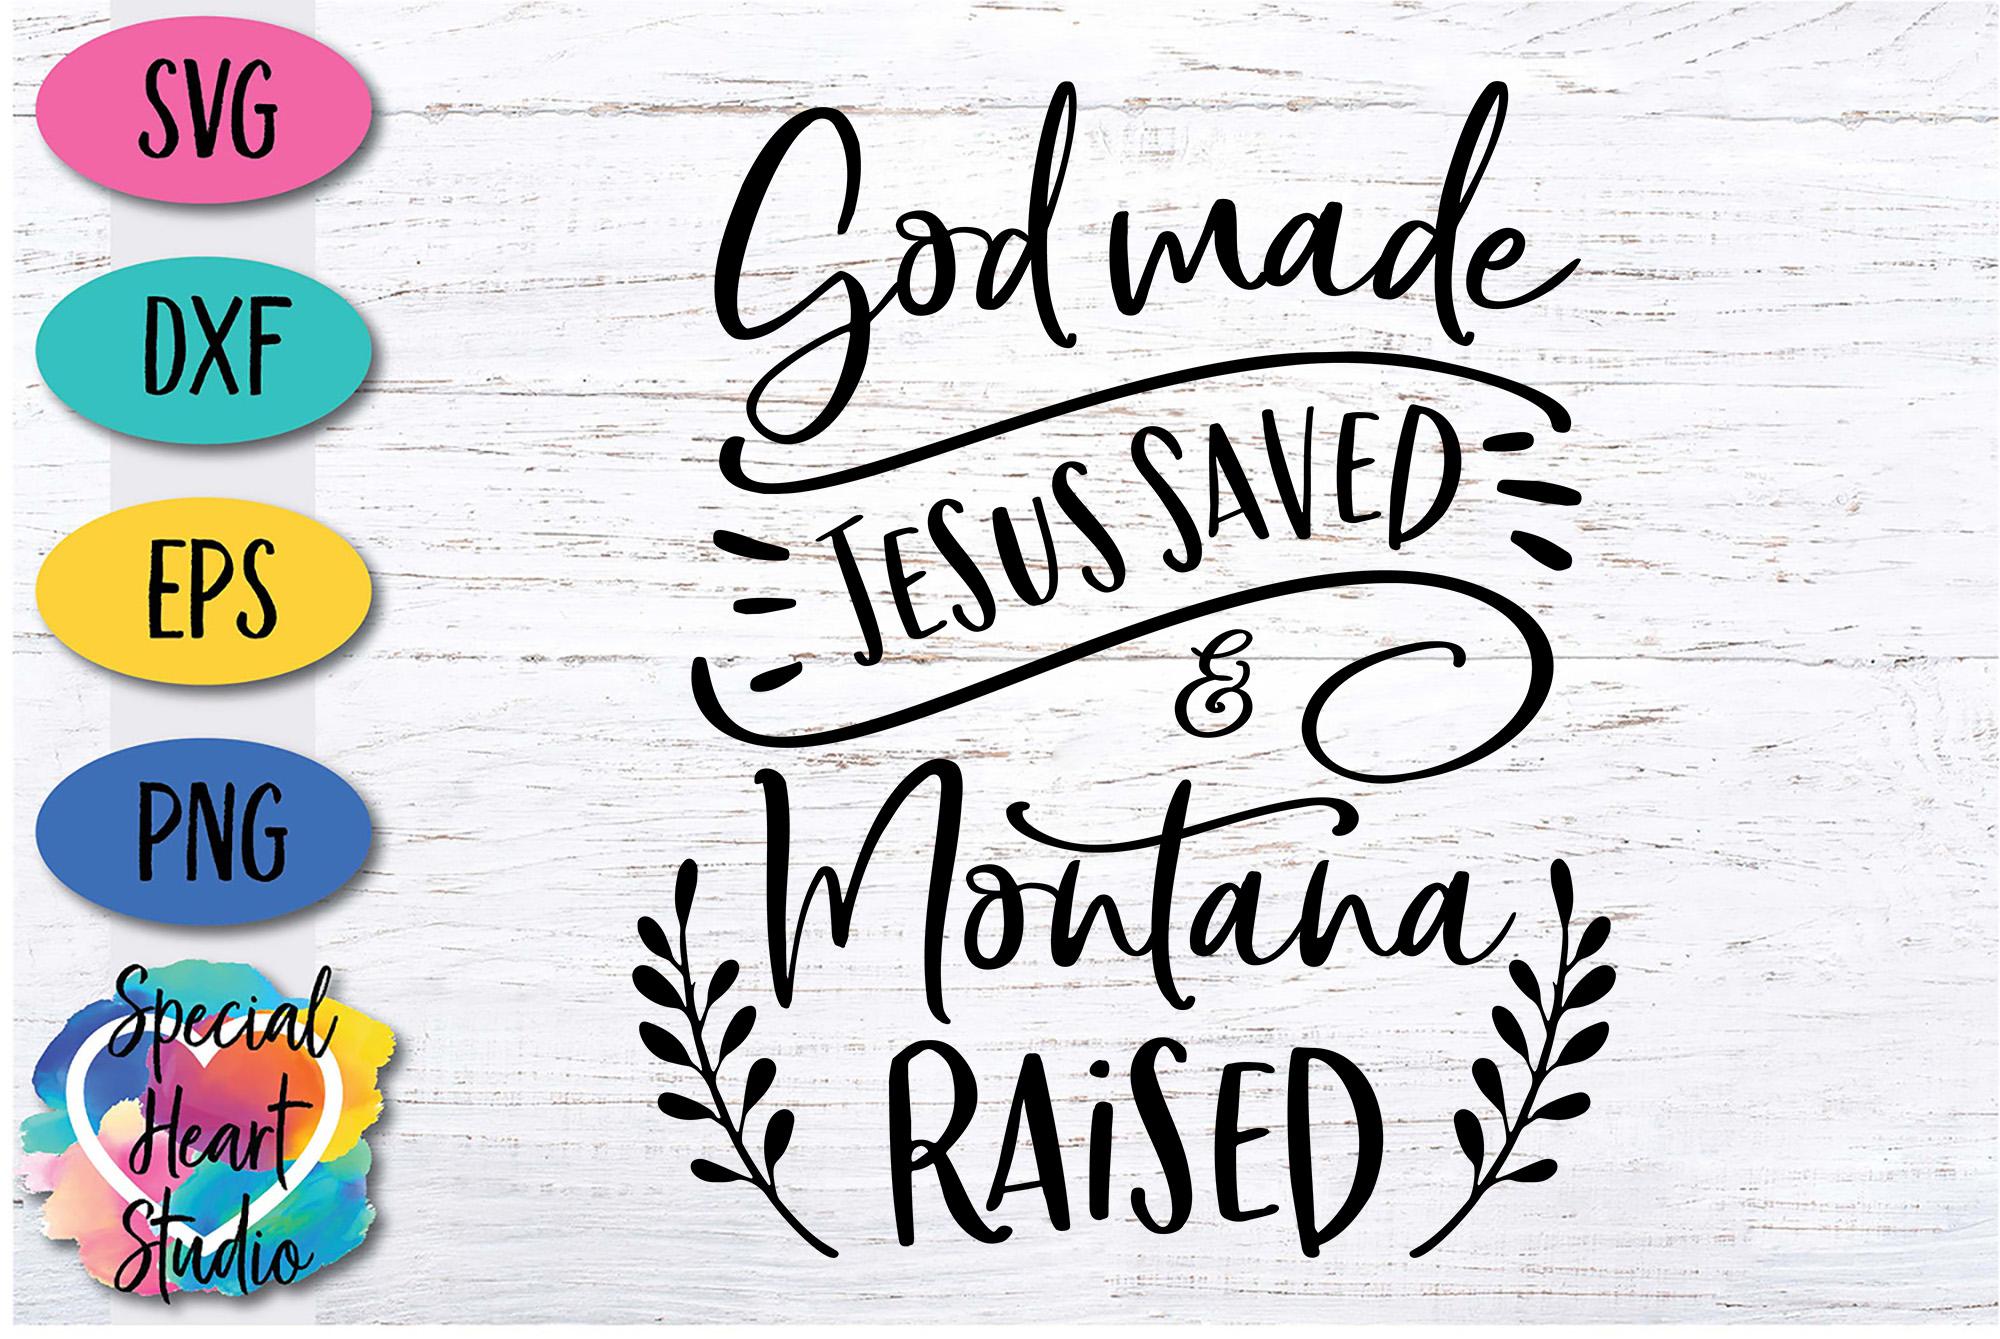 God Made Jesus Saved and Montana Raised - SVG Cut File example image 2